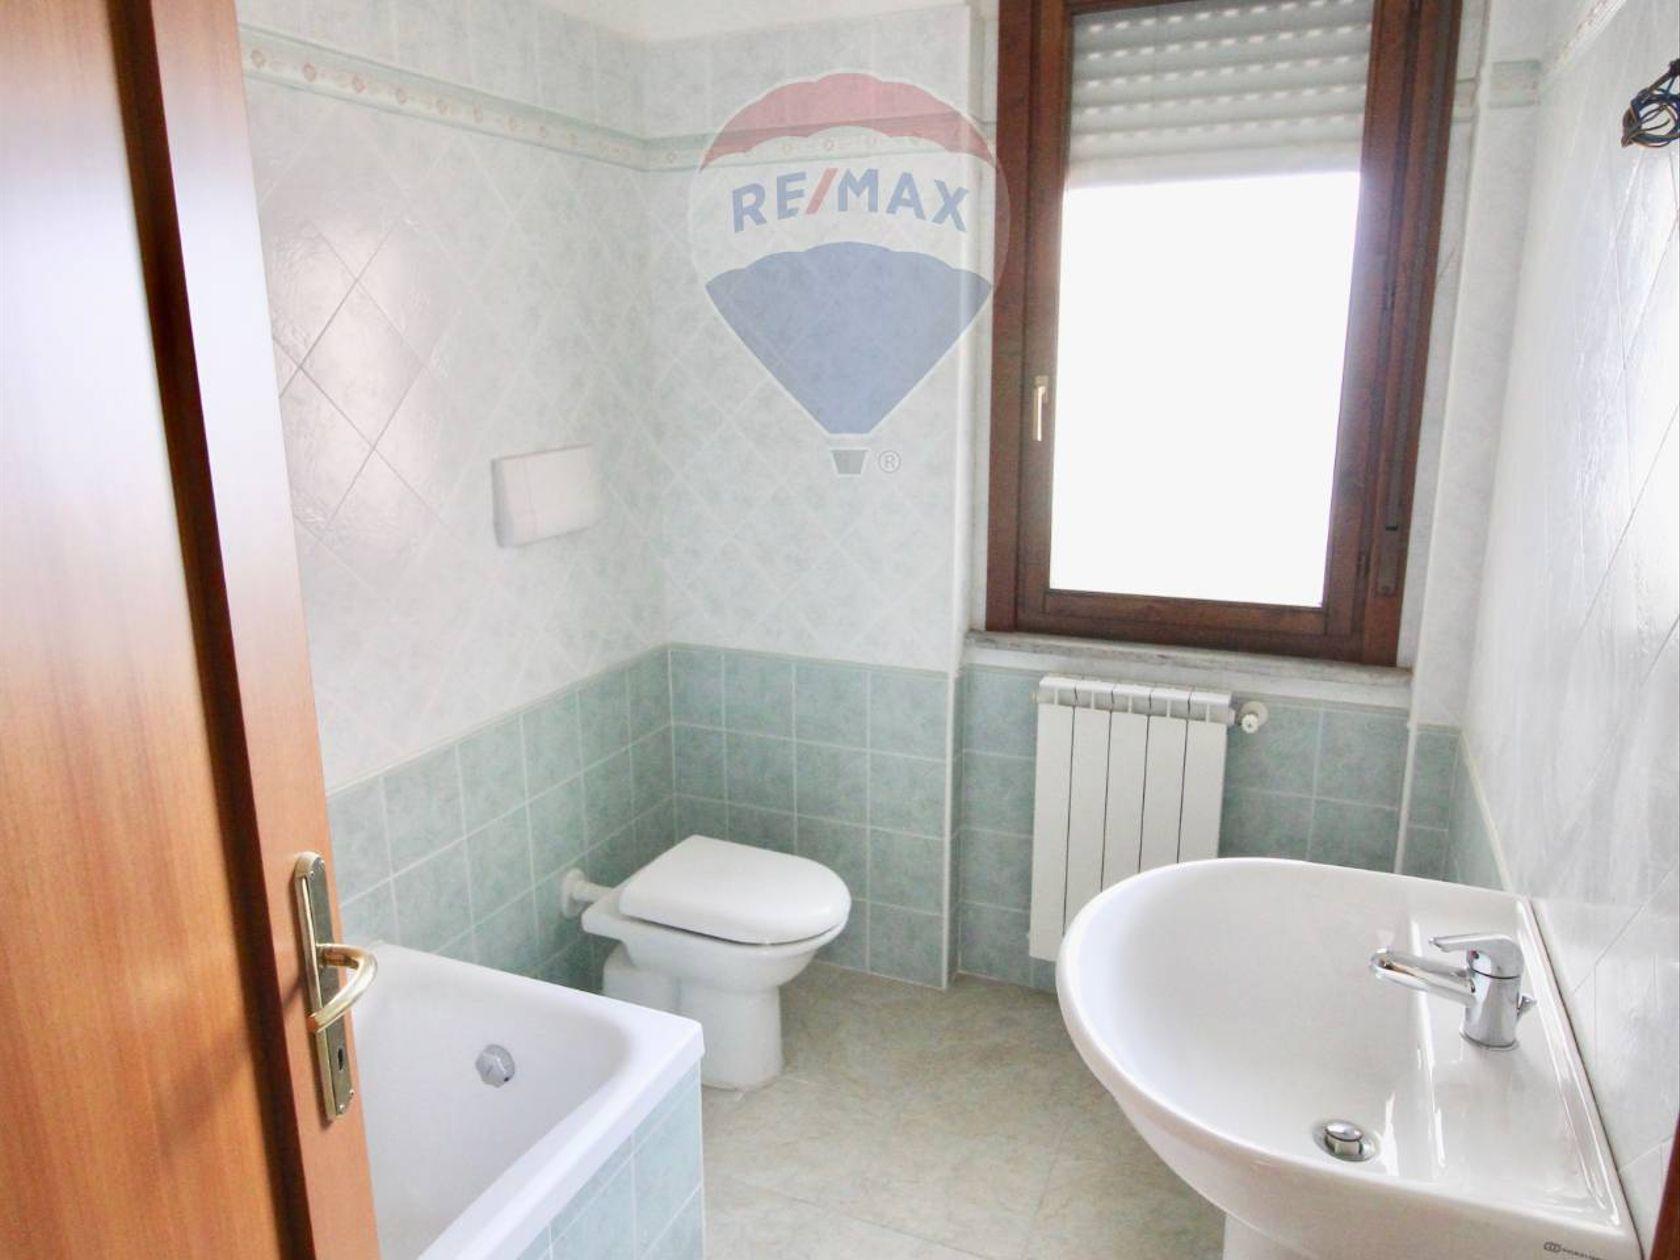 Appartamento Ss-s. Orsola Storica, Sassari, SS Vendita - Foto 12